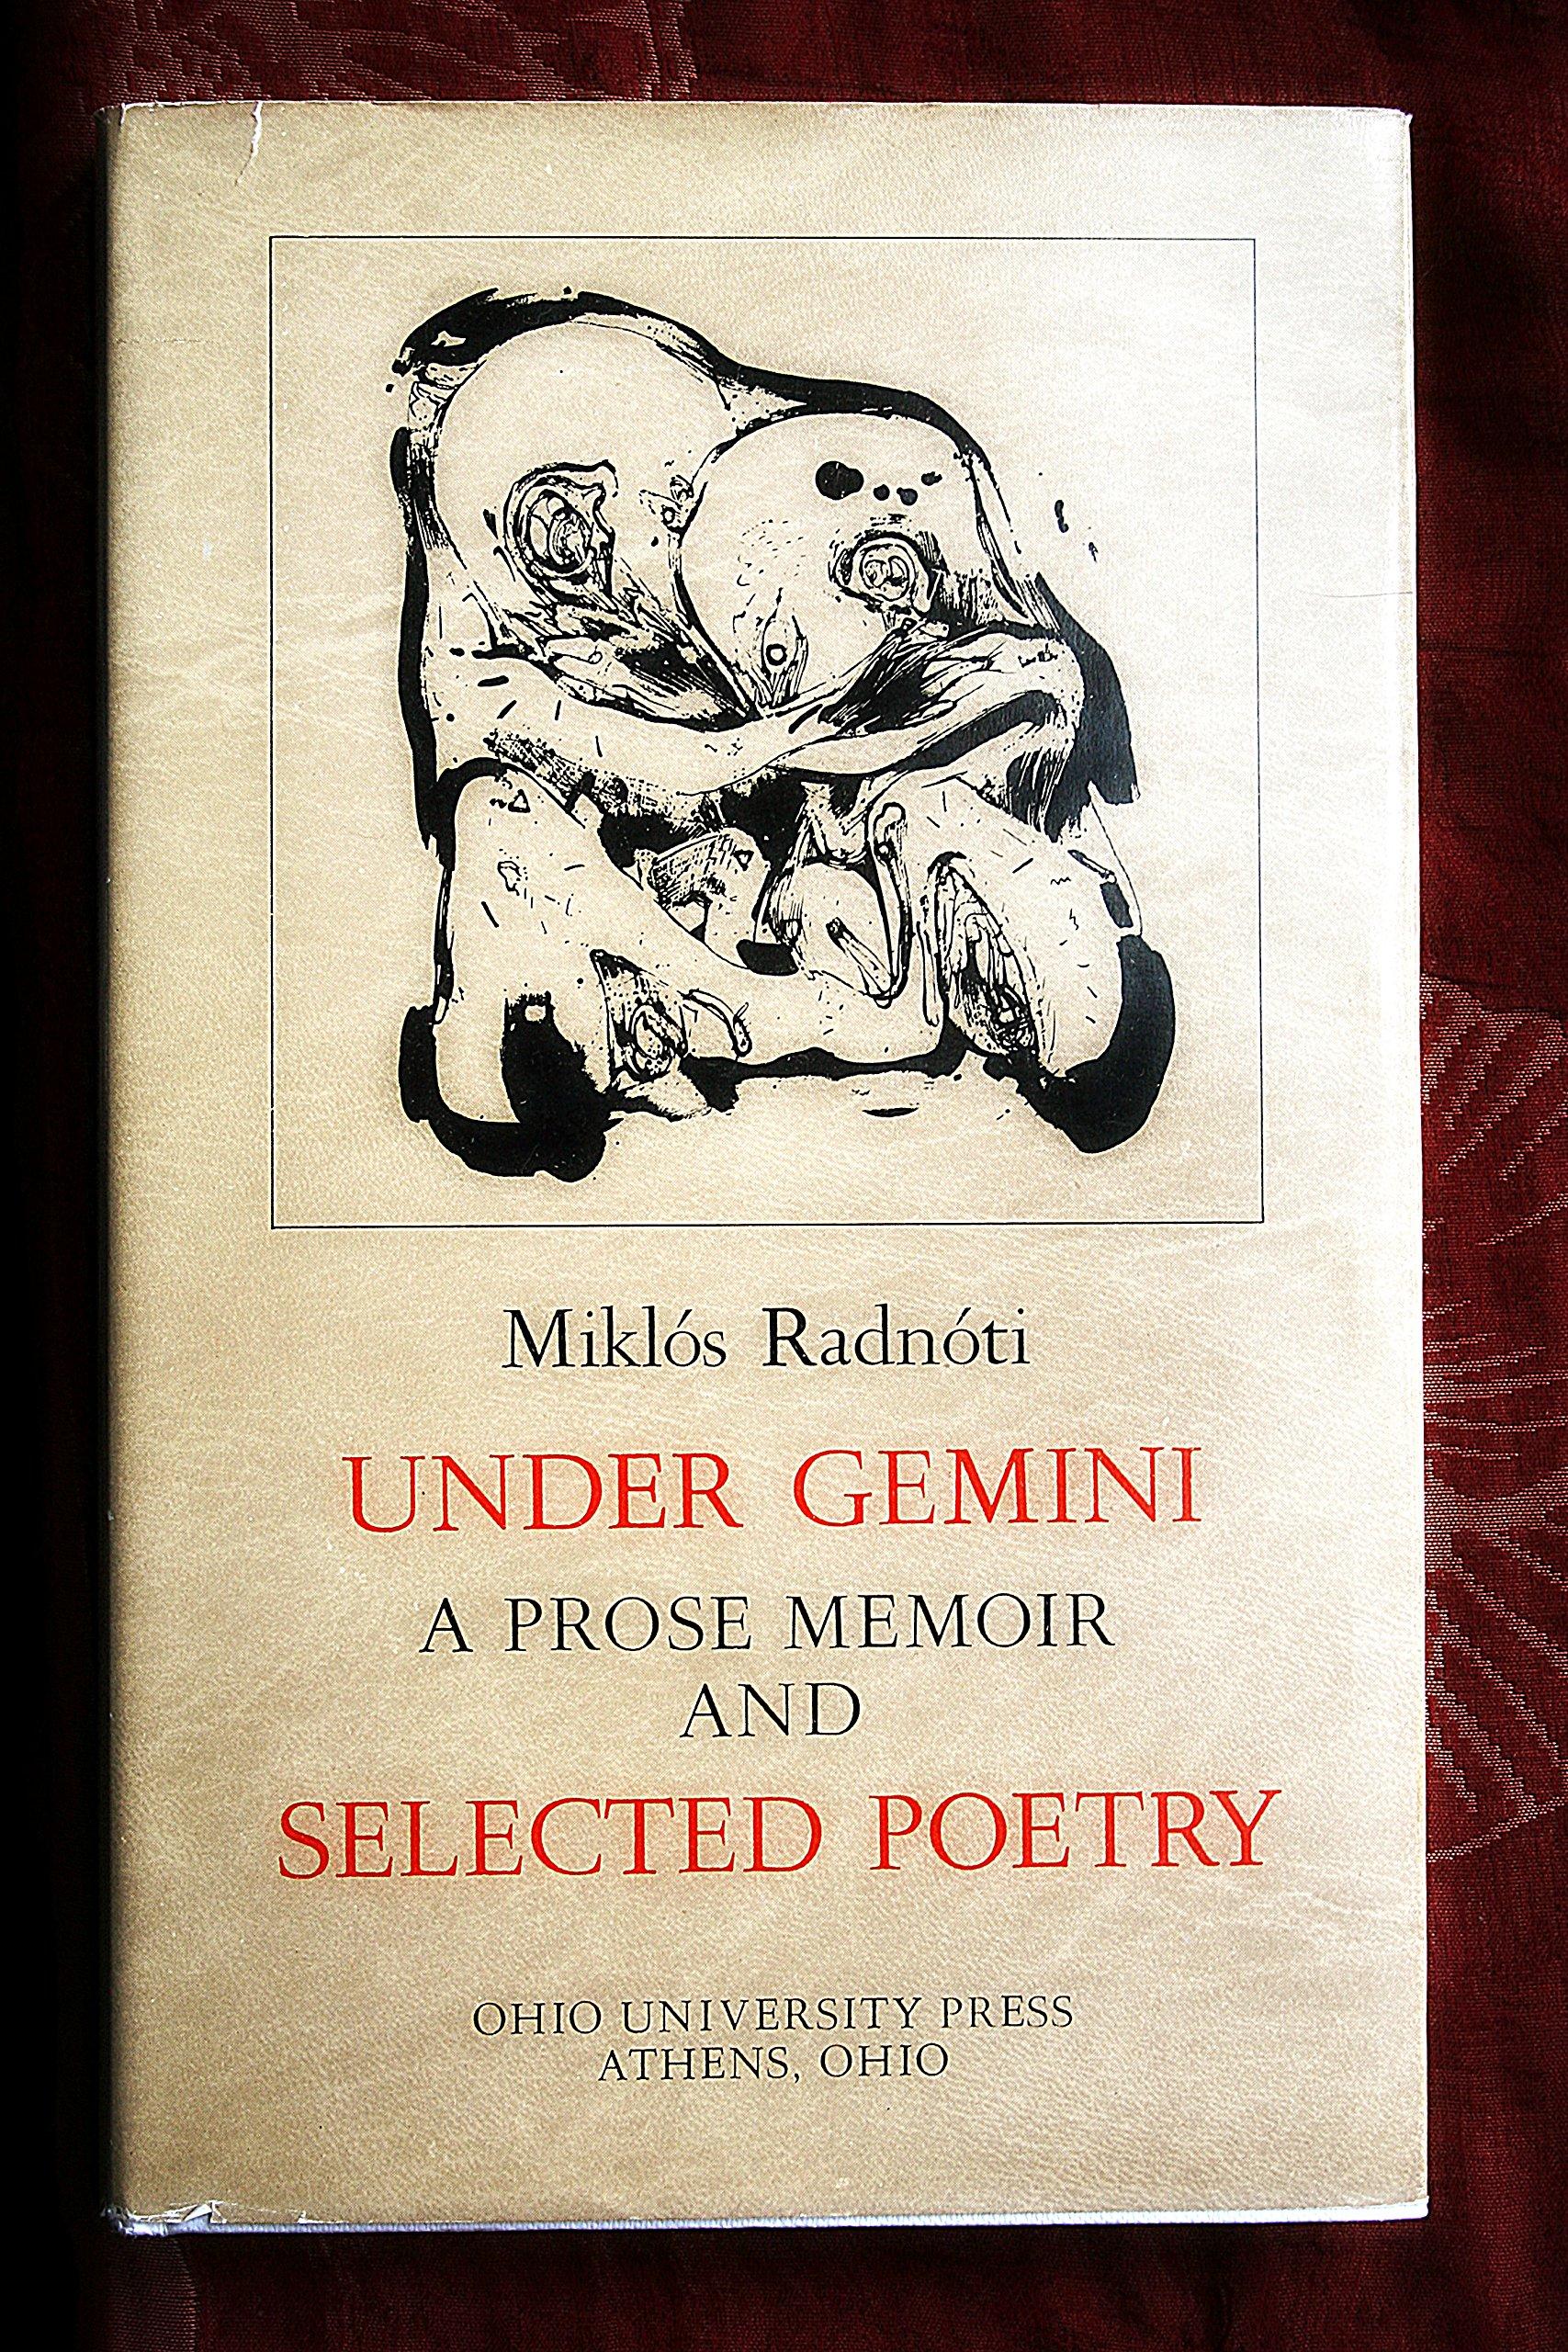 Miklos Radnoti Poems Poetry Miklos Radnoti